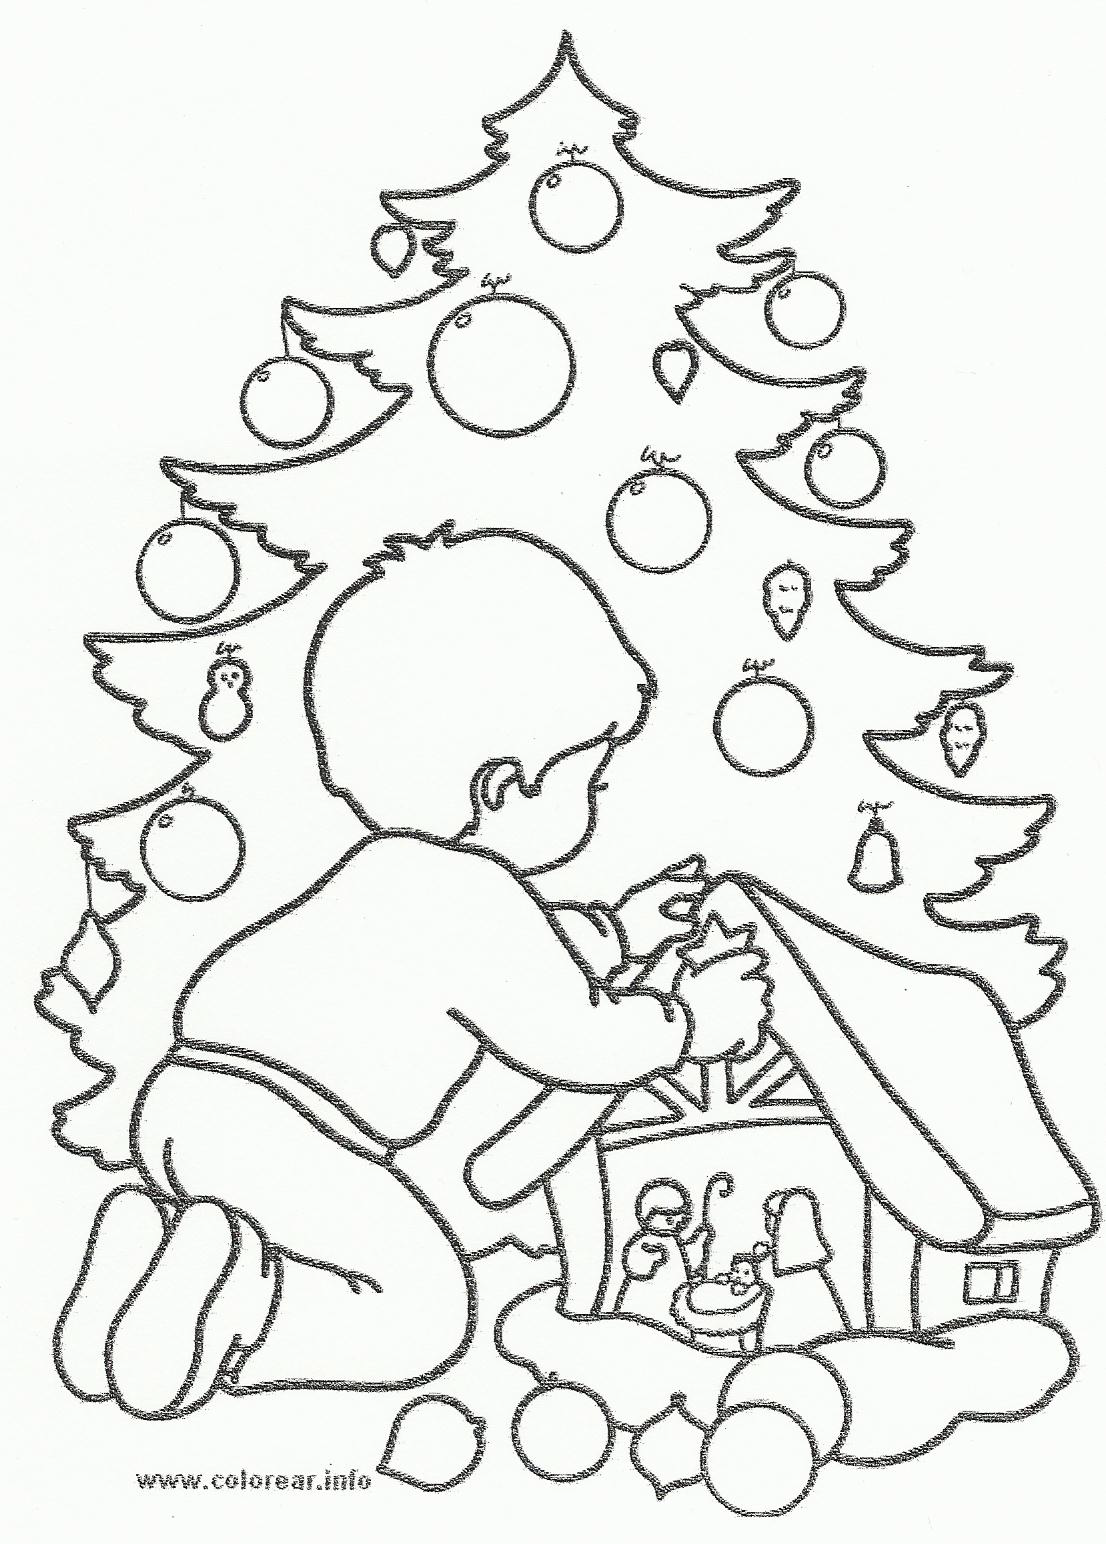 Ciavieja bilingüe blog: Christmas worksheets